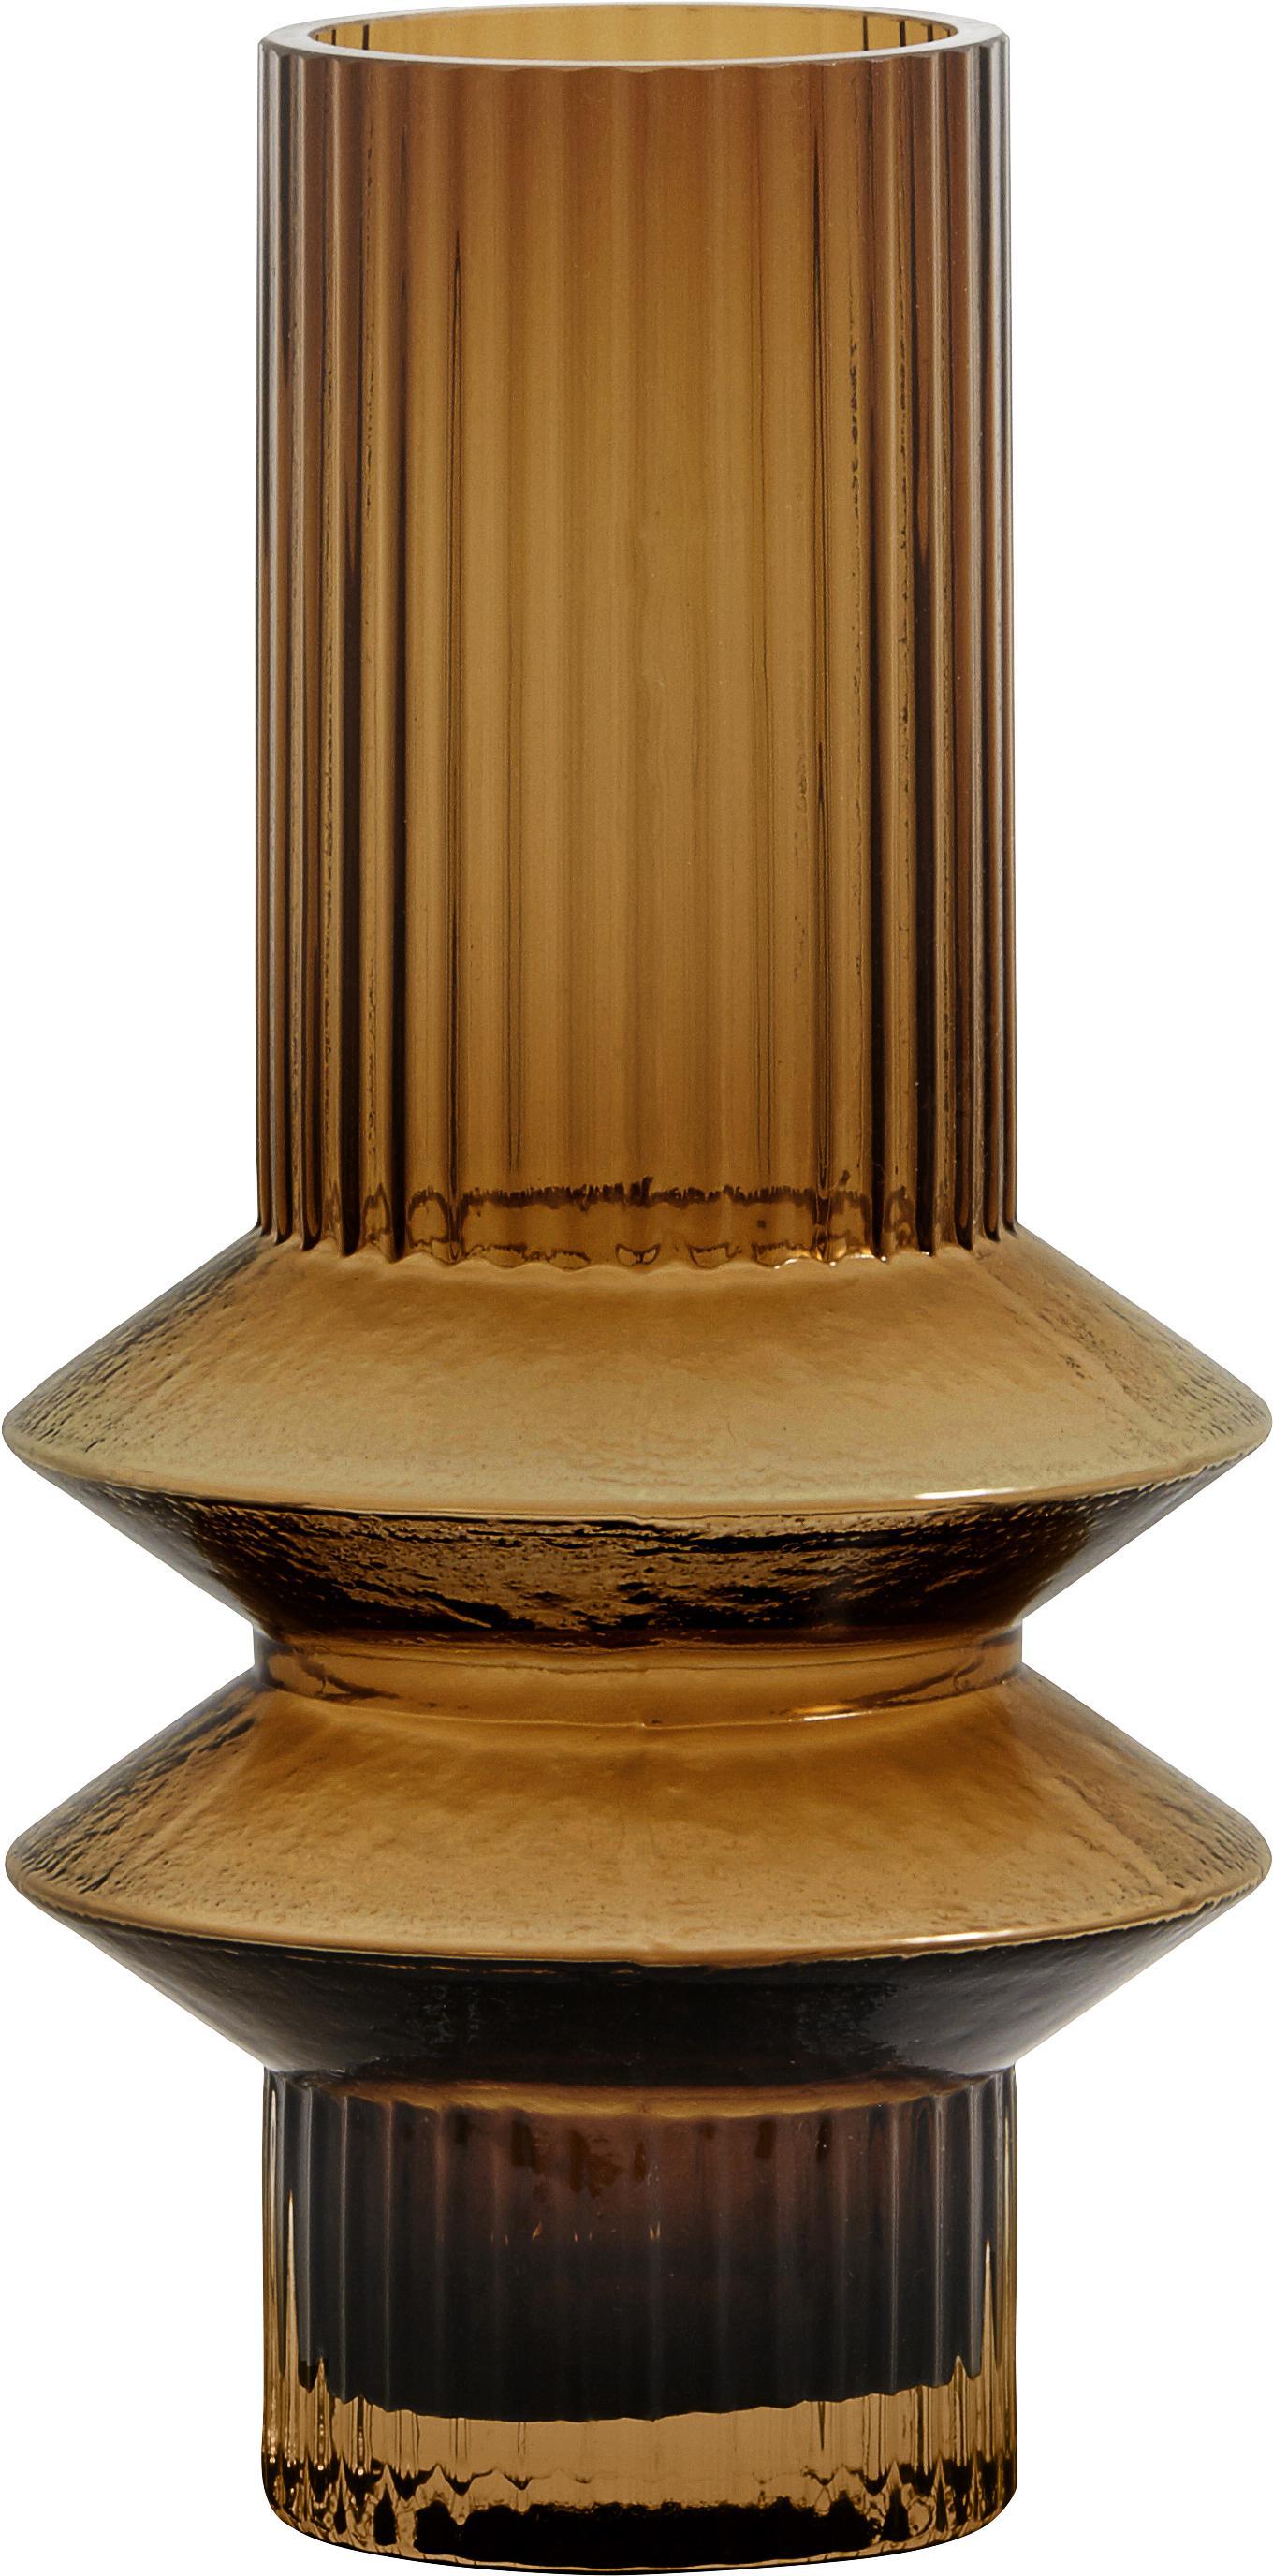 Glazen vaas Rilla, Glas, Amberkleurig, Ø 10 x H 21 cm